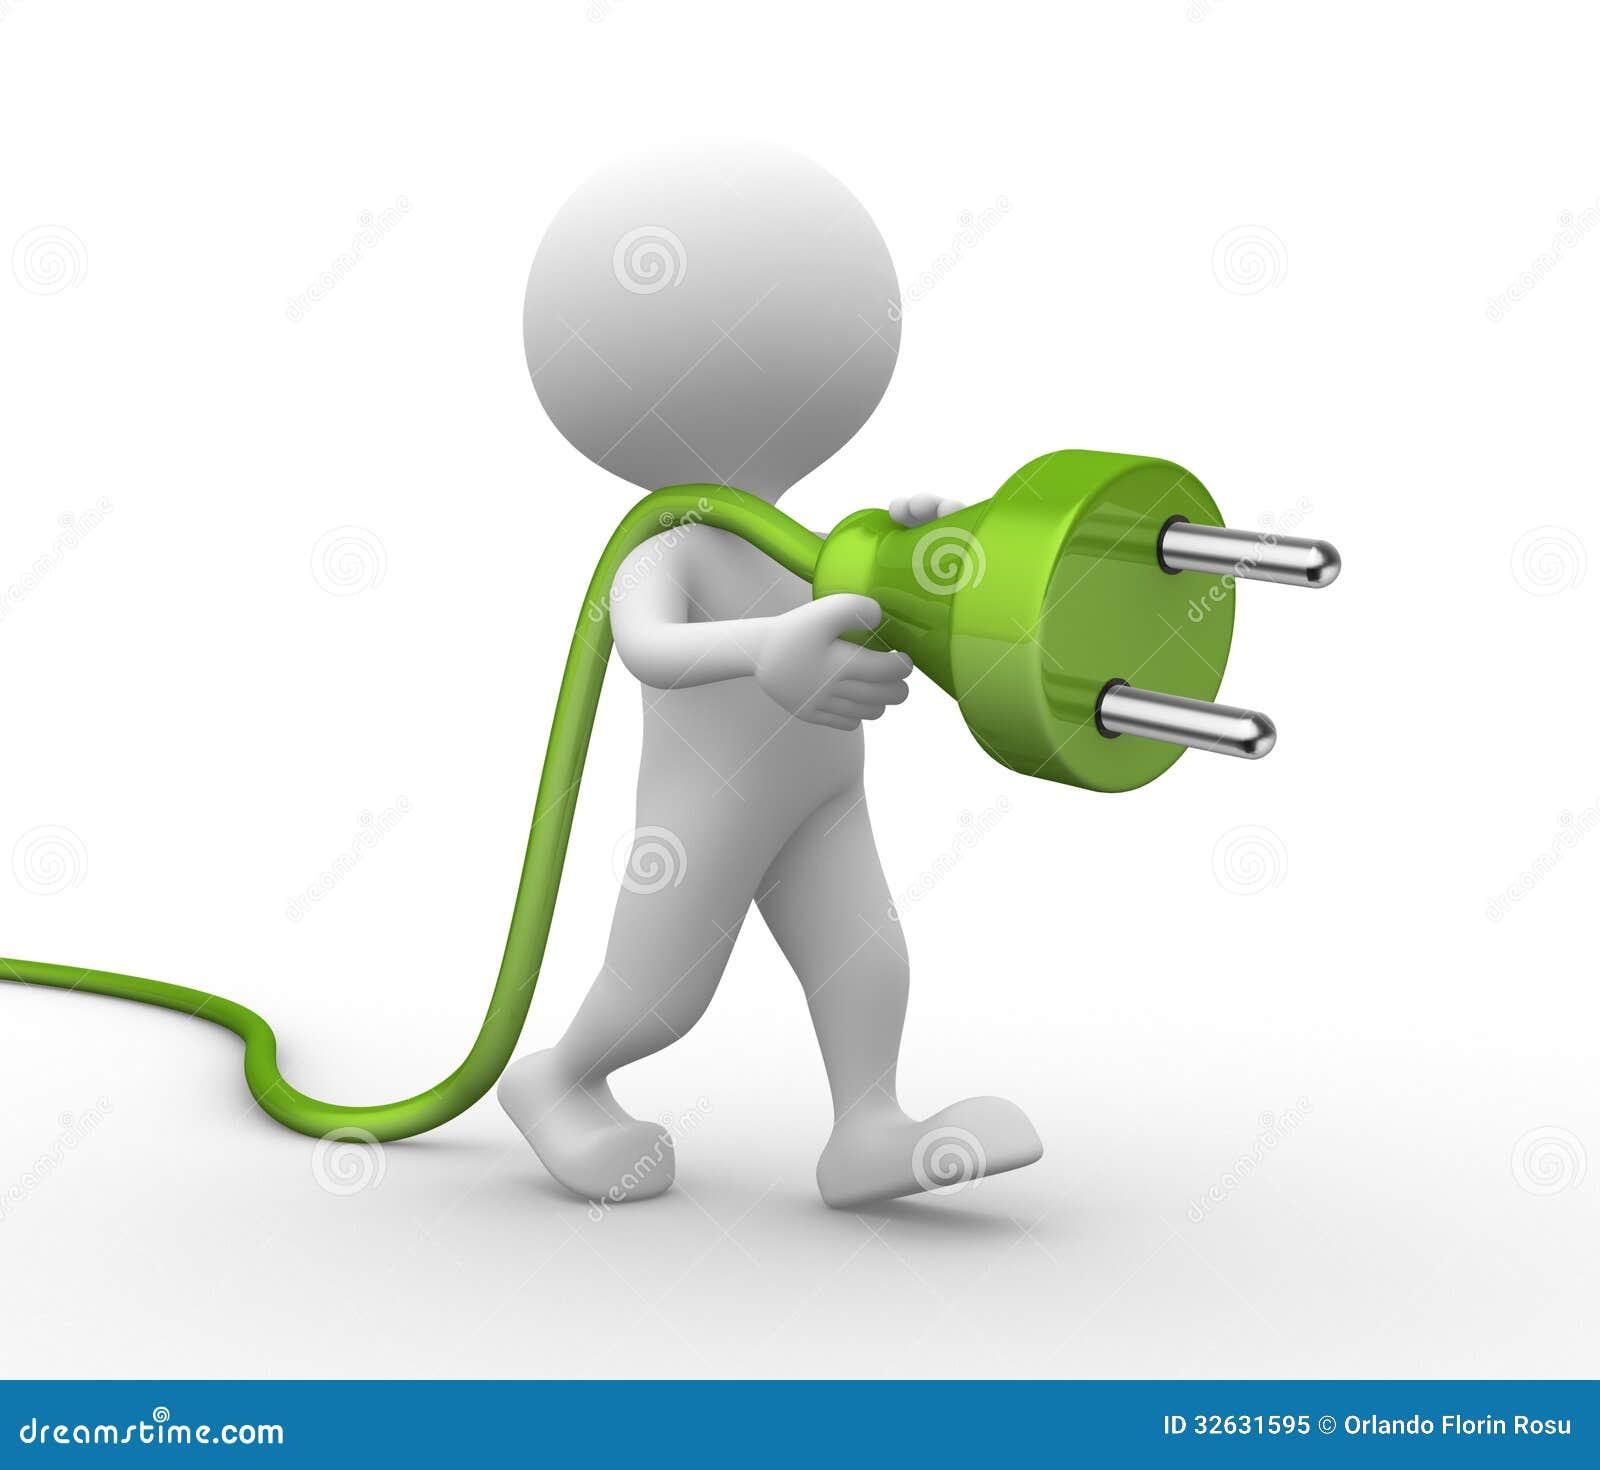 Electric Plug Royalty Free Stock Photo - Image: 32631595